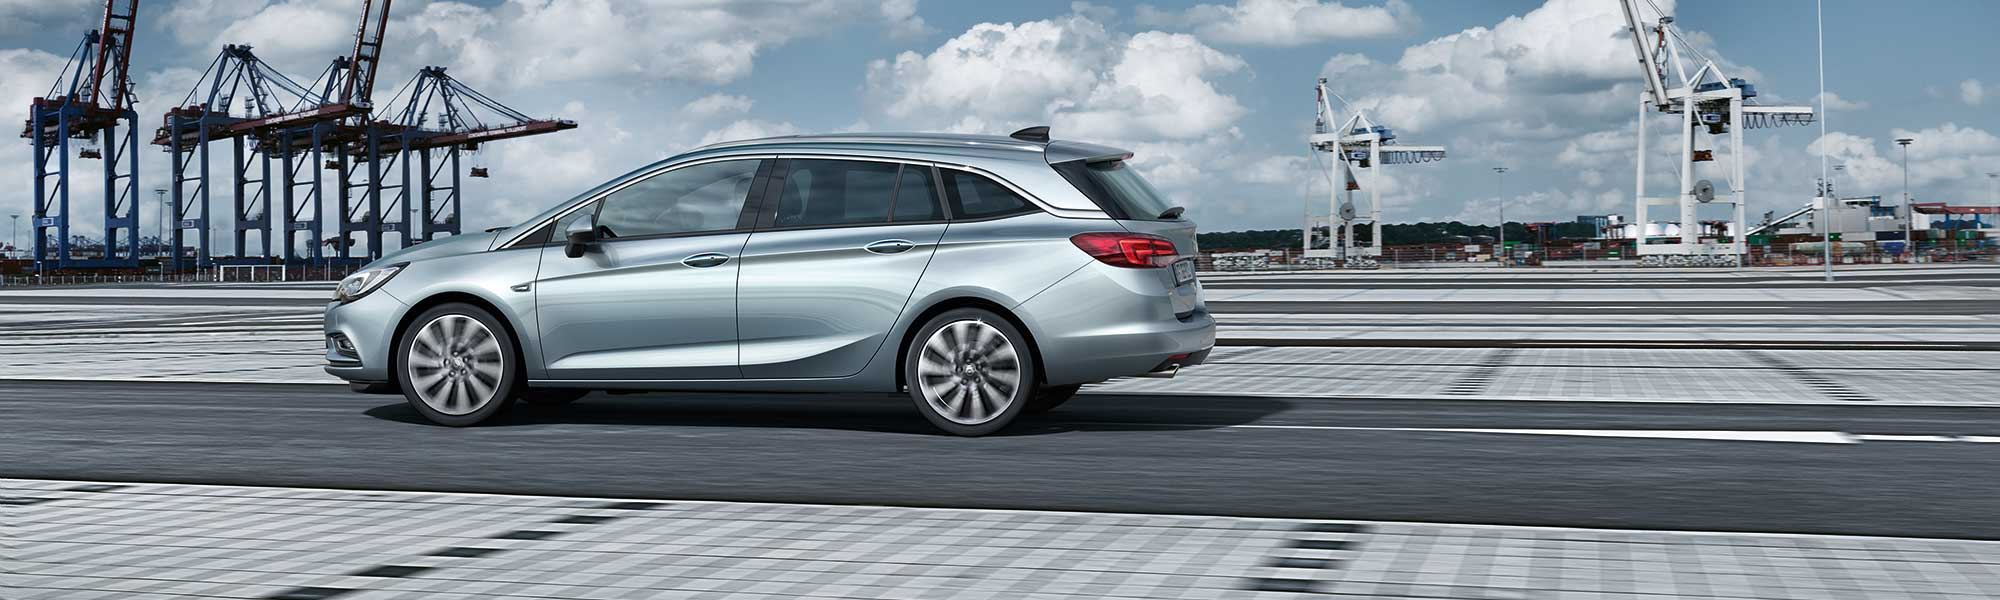 Der Opel Astra Sportstourer